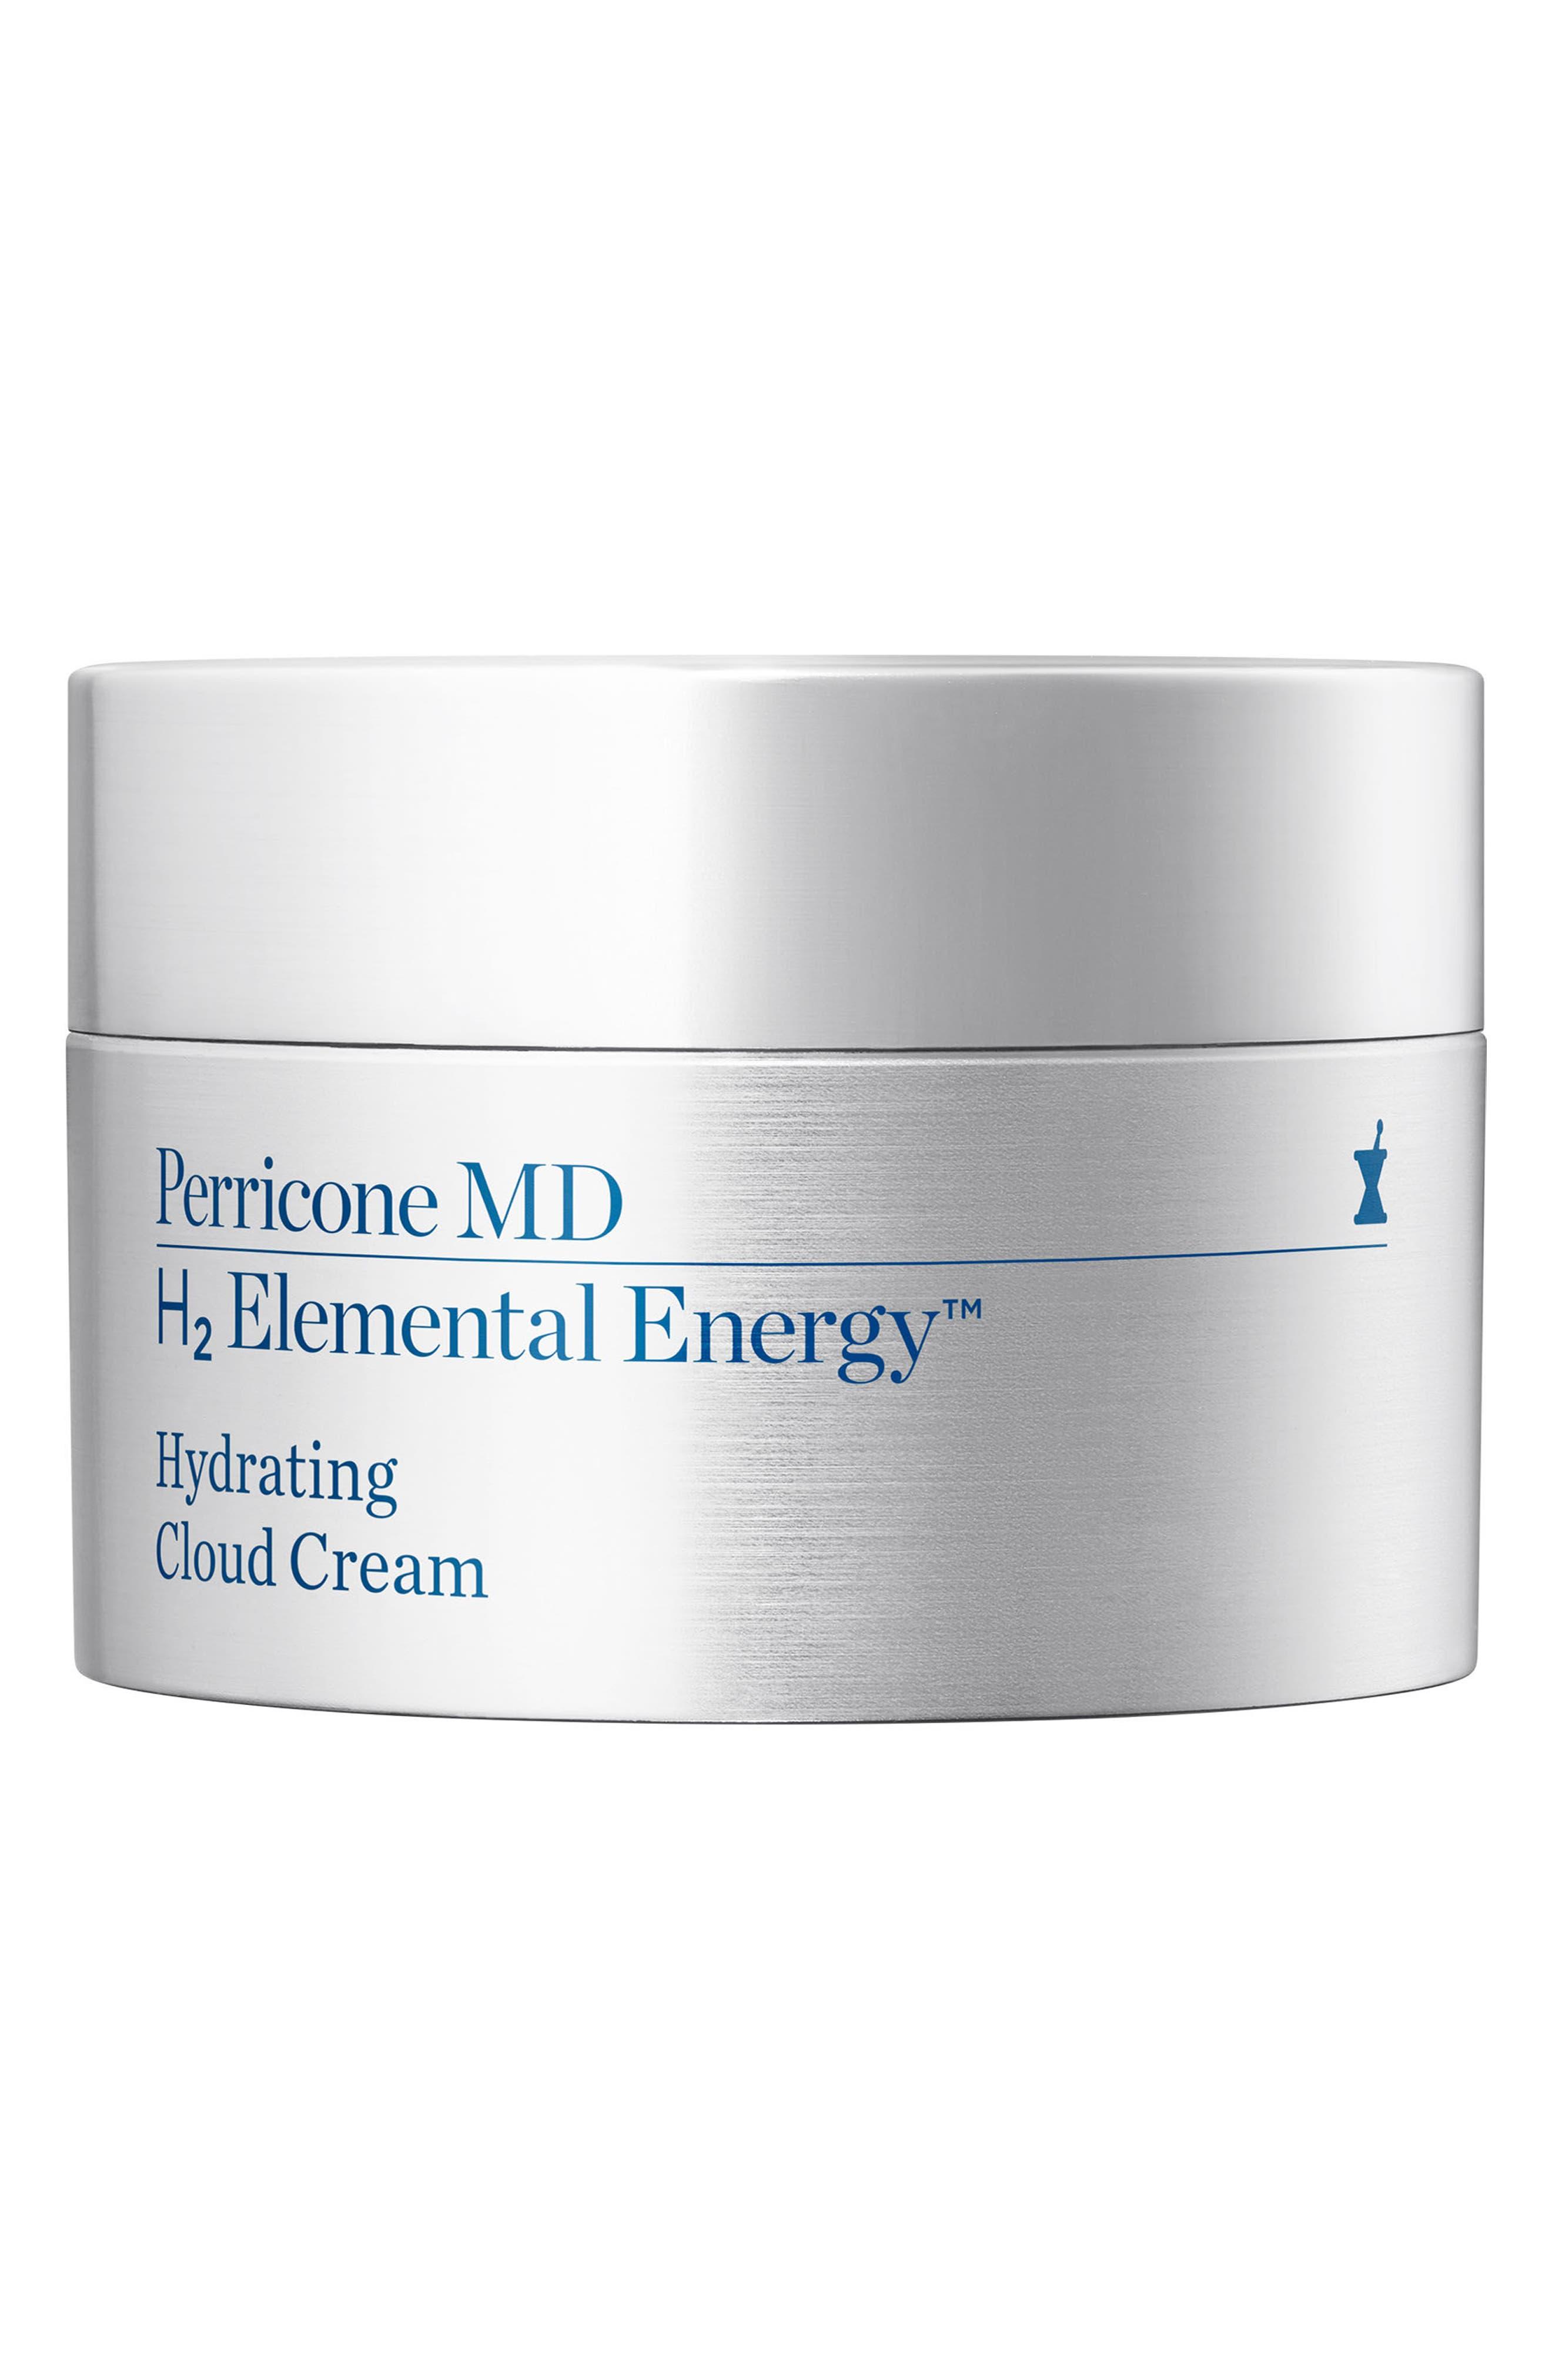 H2 Elemental Energy Hydrating Cloud Cream,                             Main thumbnail 1, color,                             000